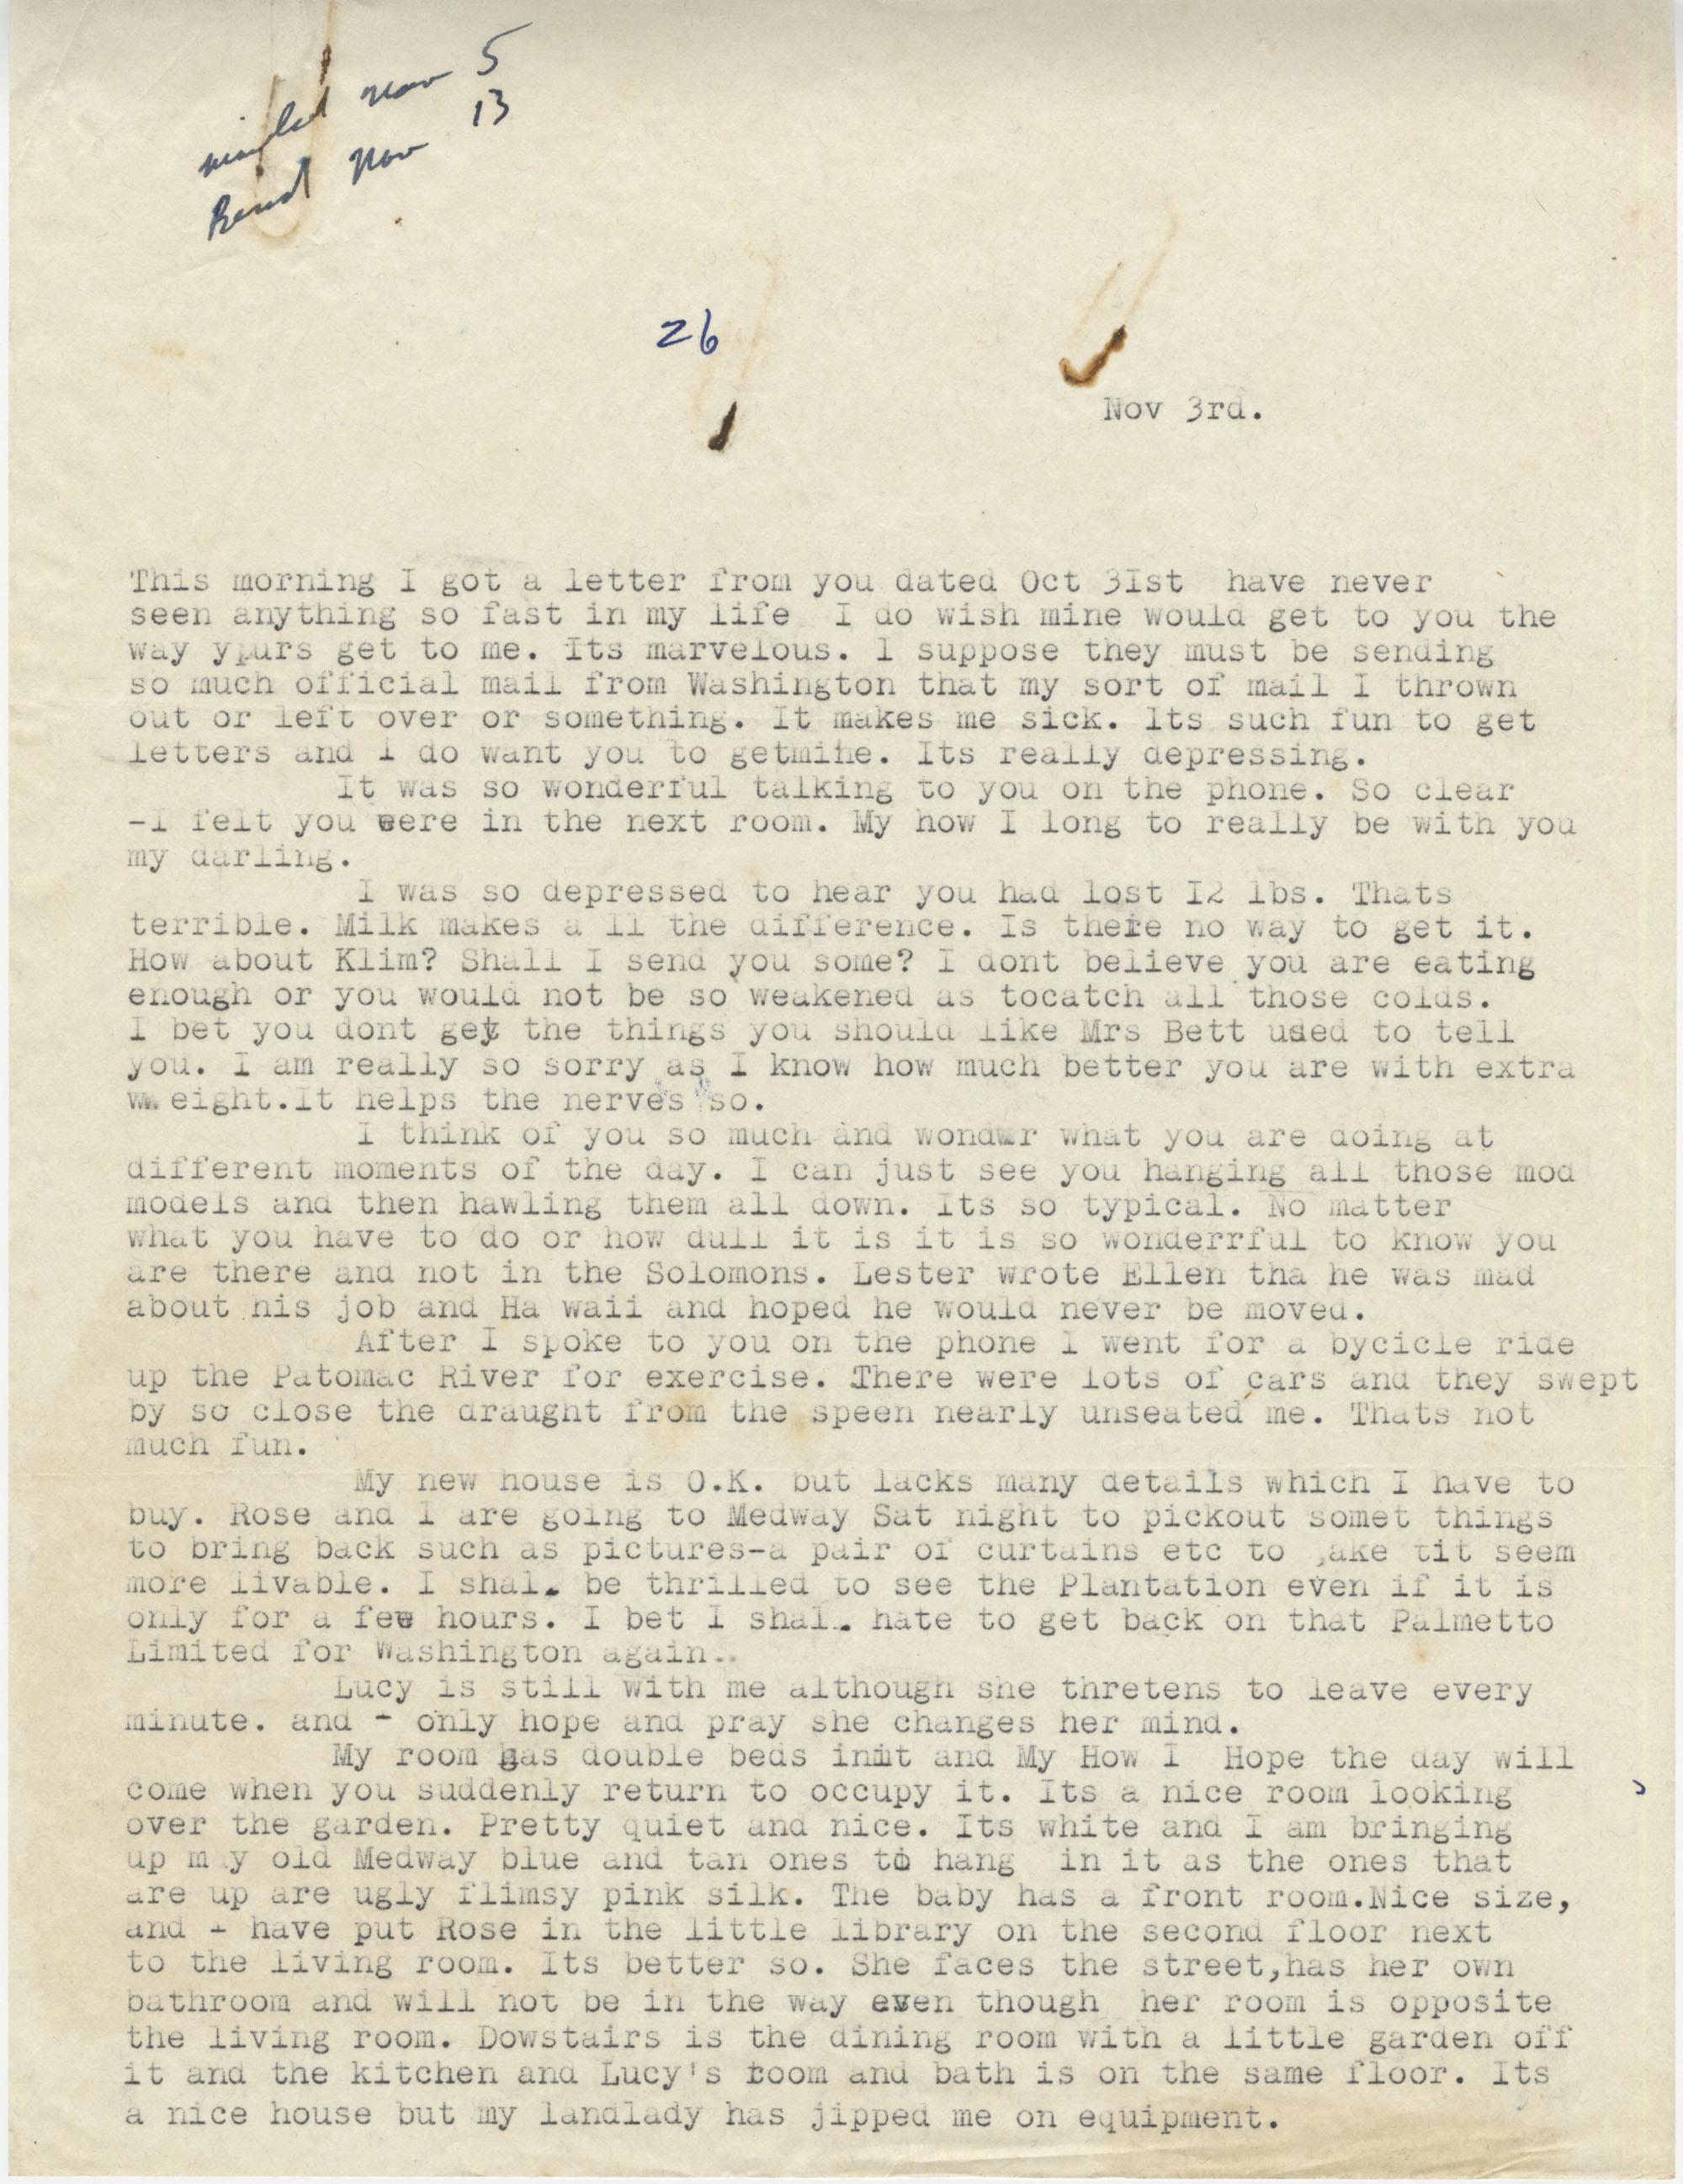 Letter from Gertrude Sanford Legendre, November 3, 1942